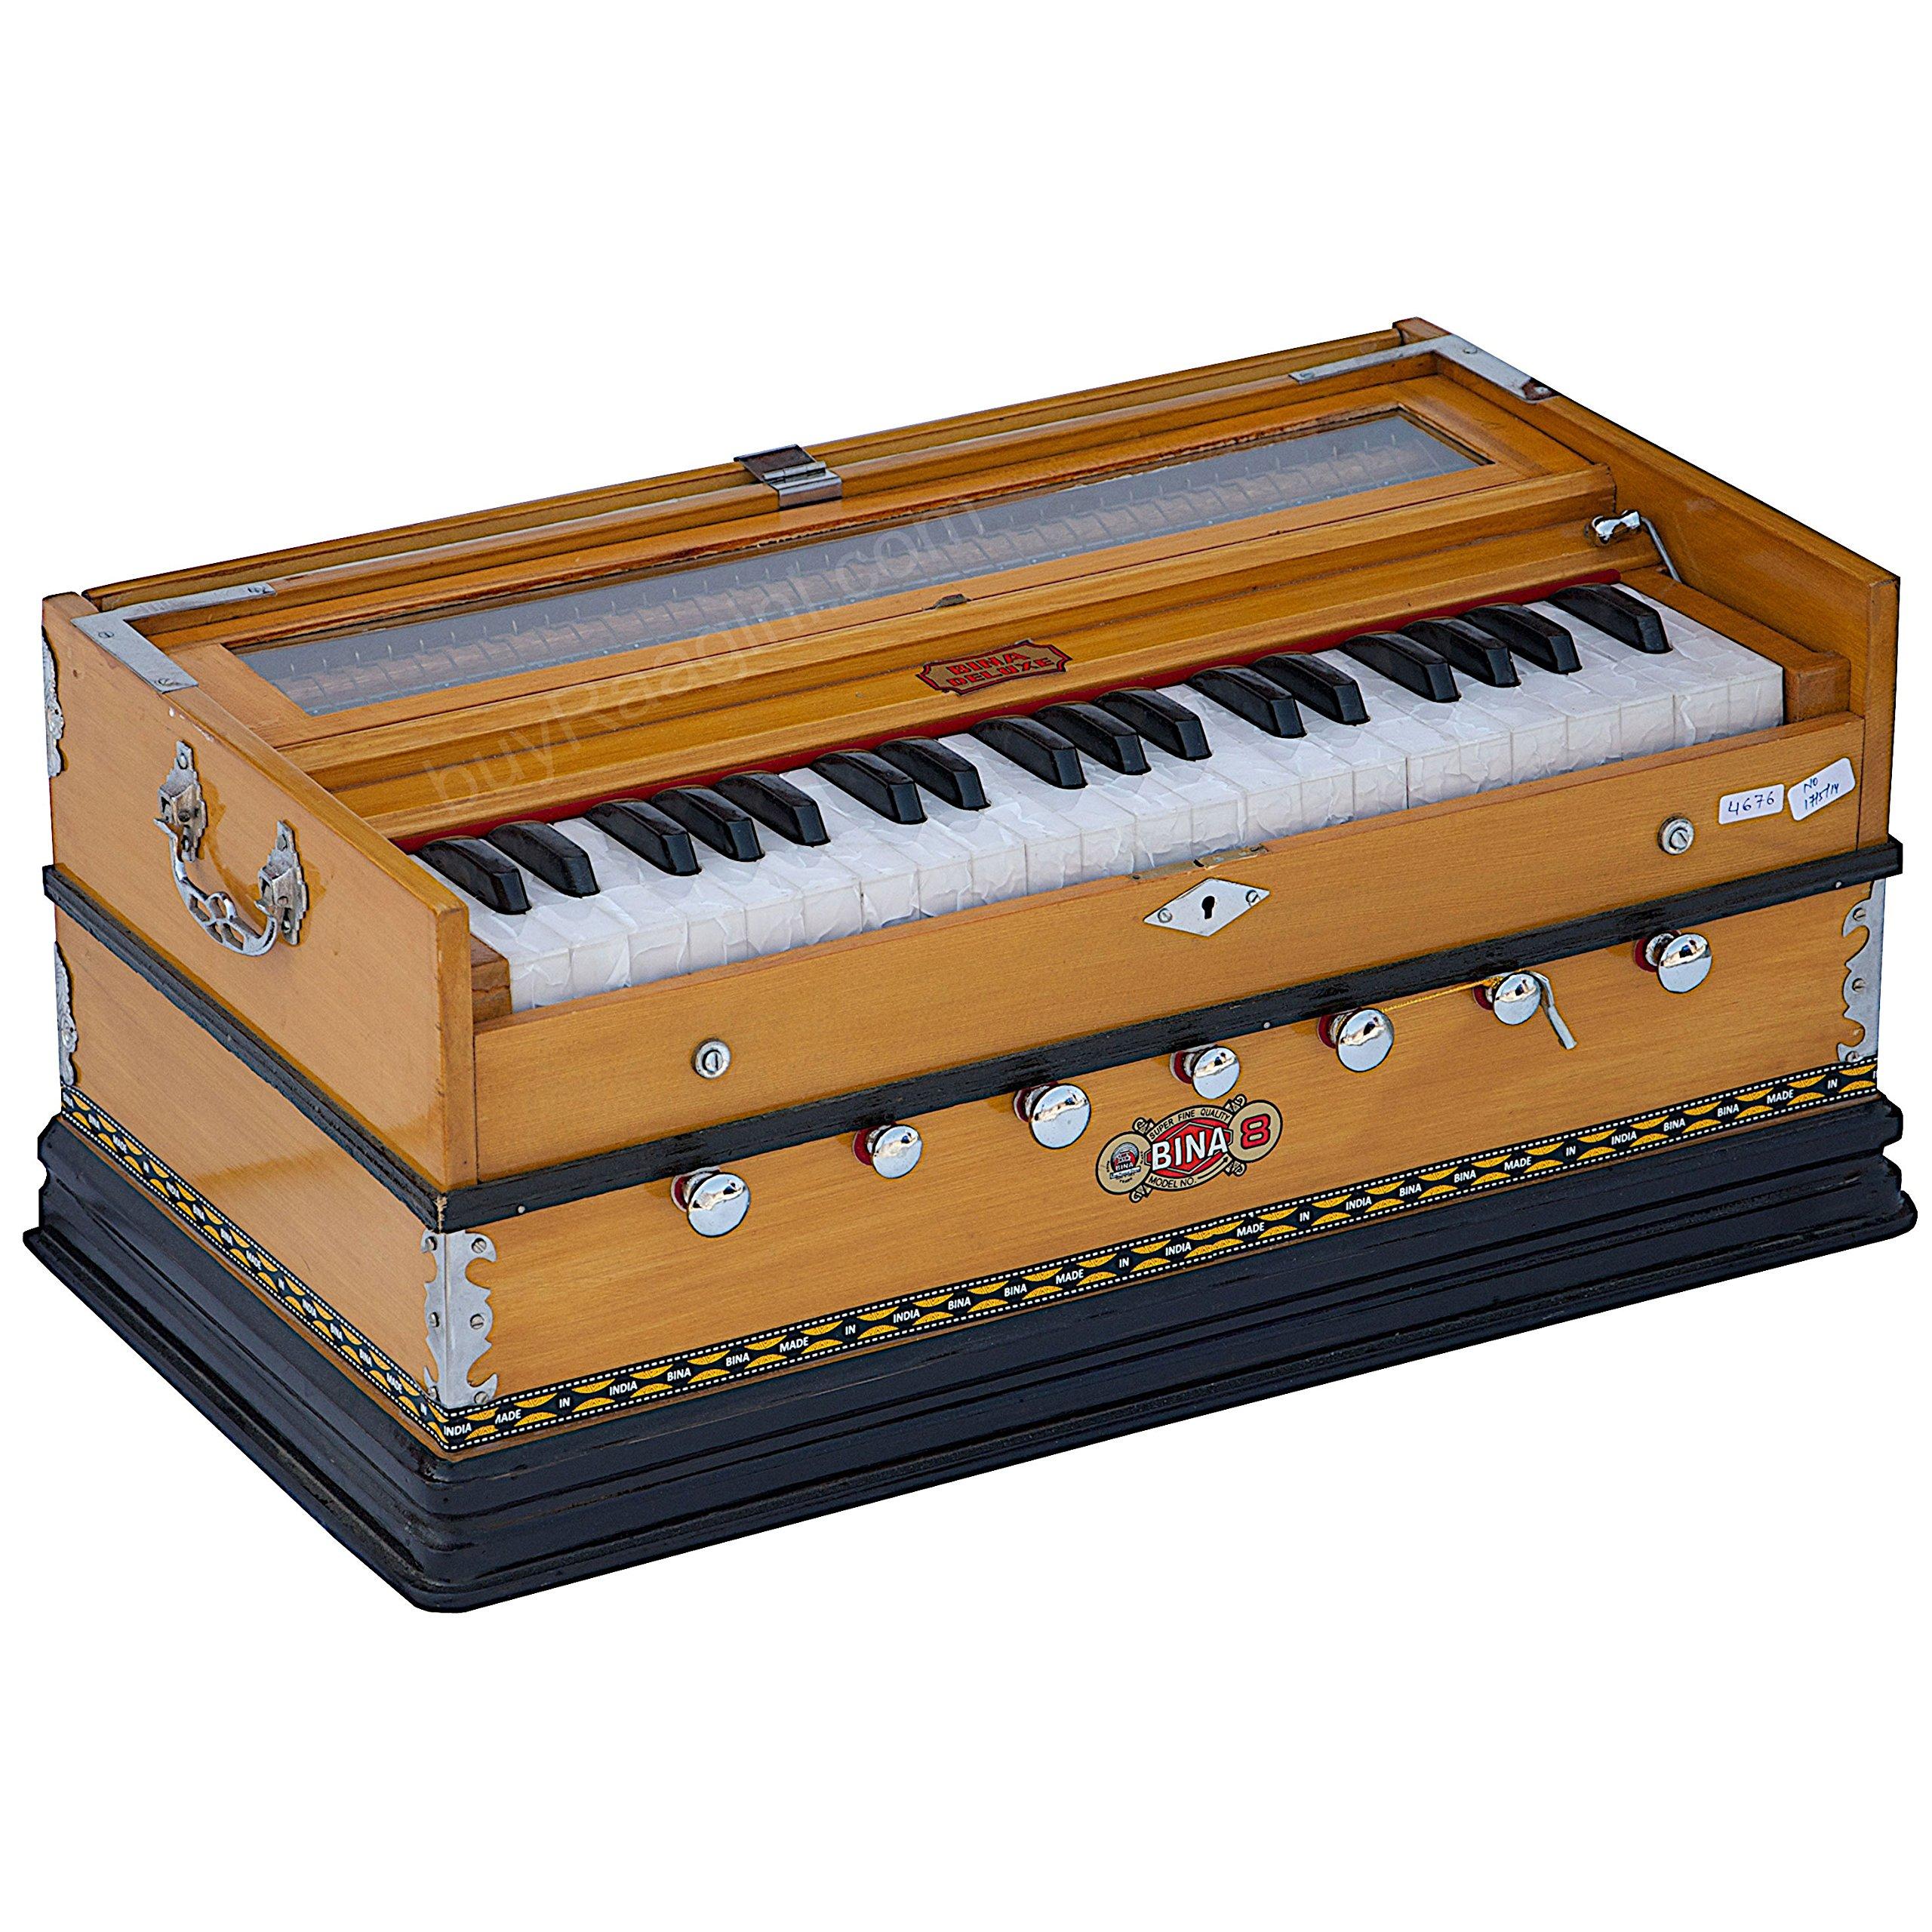 Harmonium Musical Instrument, BINA No. 8, 7 Stops, 3 1/4 Octaves, Coupler, Tuned To A400, Double Reed, Natural Color, Book, Nylon Bag (PDI-DJF) by Bina (Image #5)